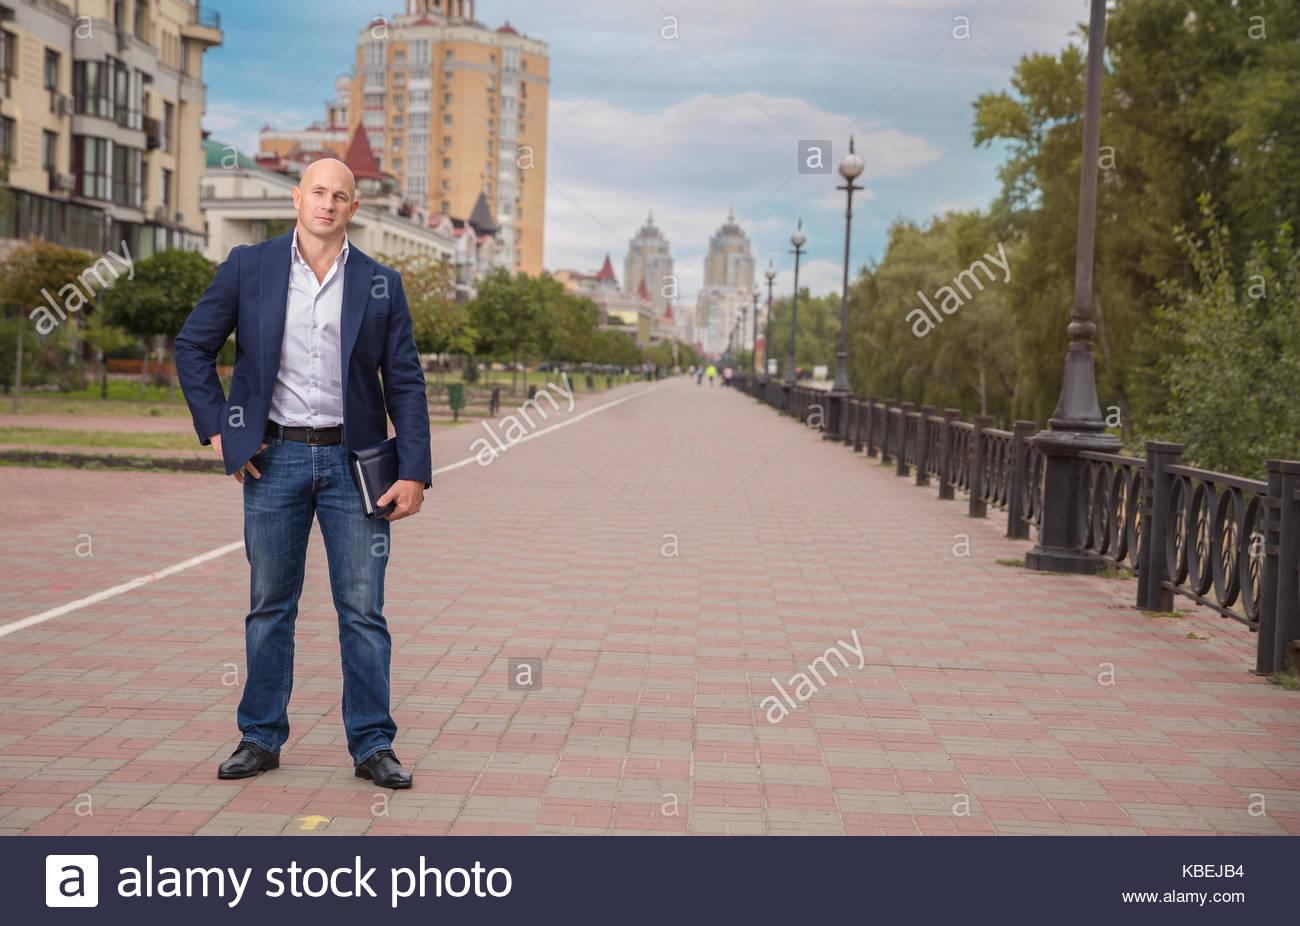 Handsome Bald businessman, realtor staying on sidewalg over houses background - Stock Image